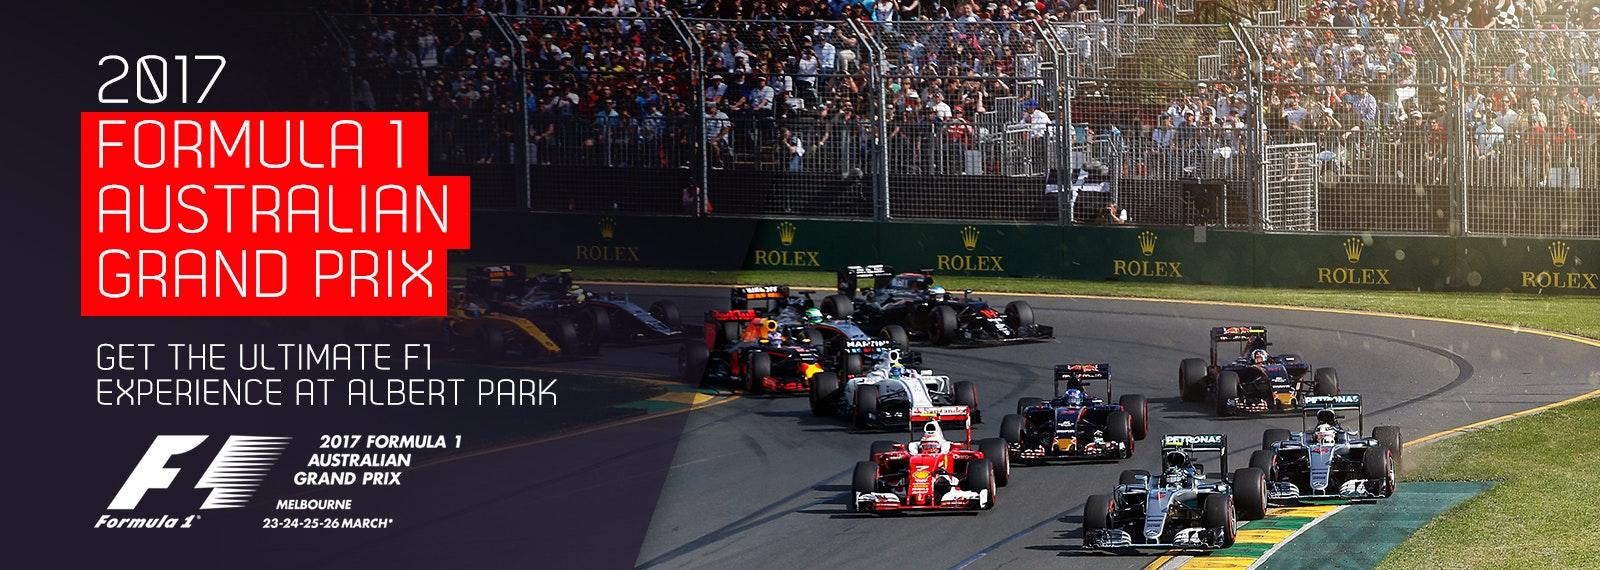 2017 Australian Formula One Grand Prix